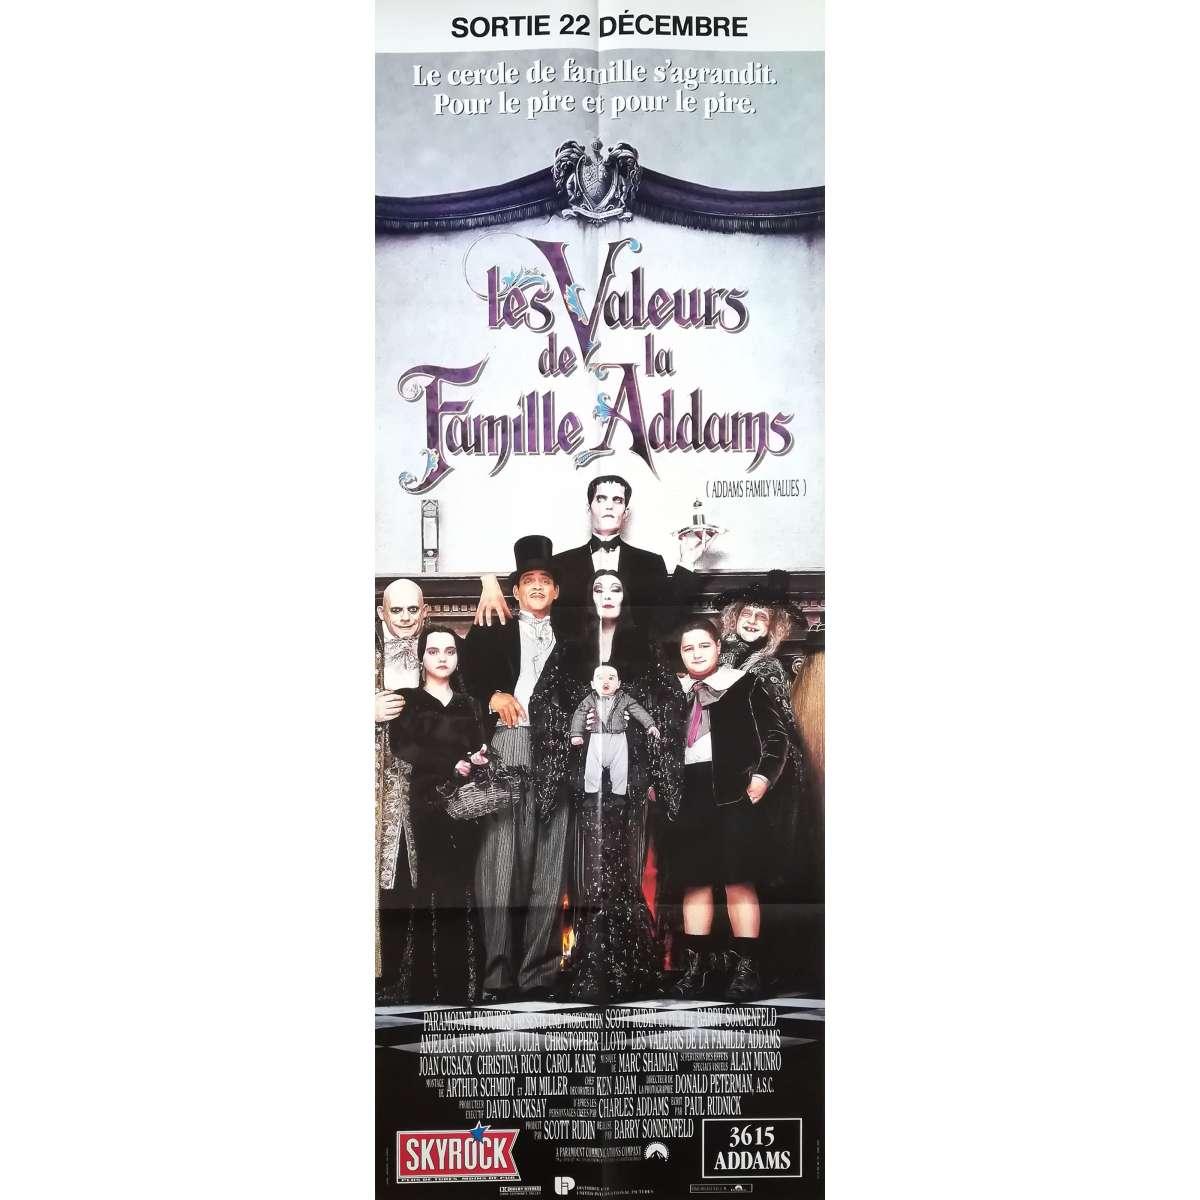 addams family values original movie poster 23x63 in 1991 barry sonnefeld christina ricci